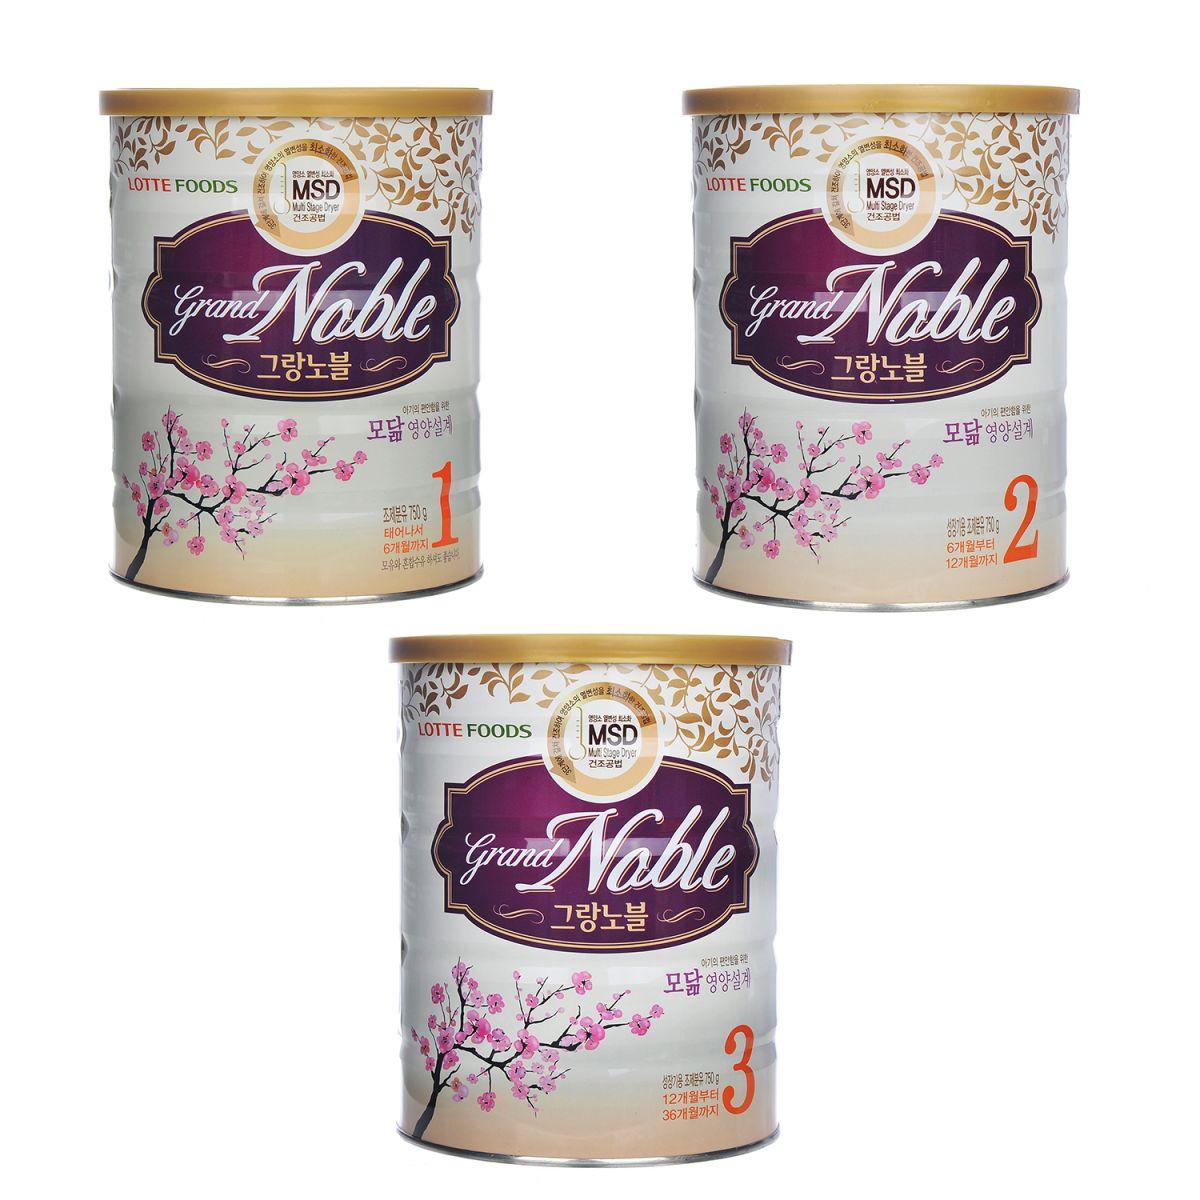 sữa grand noble của hàn quốc